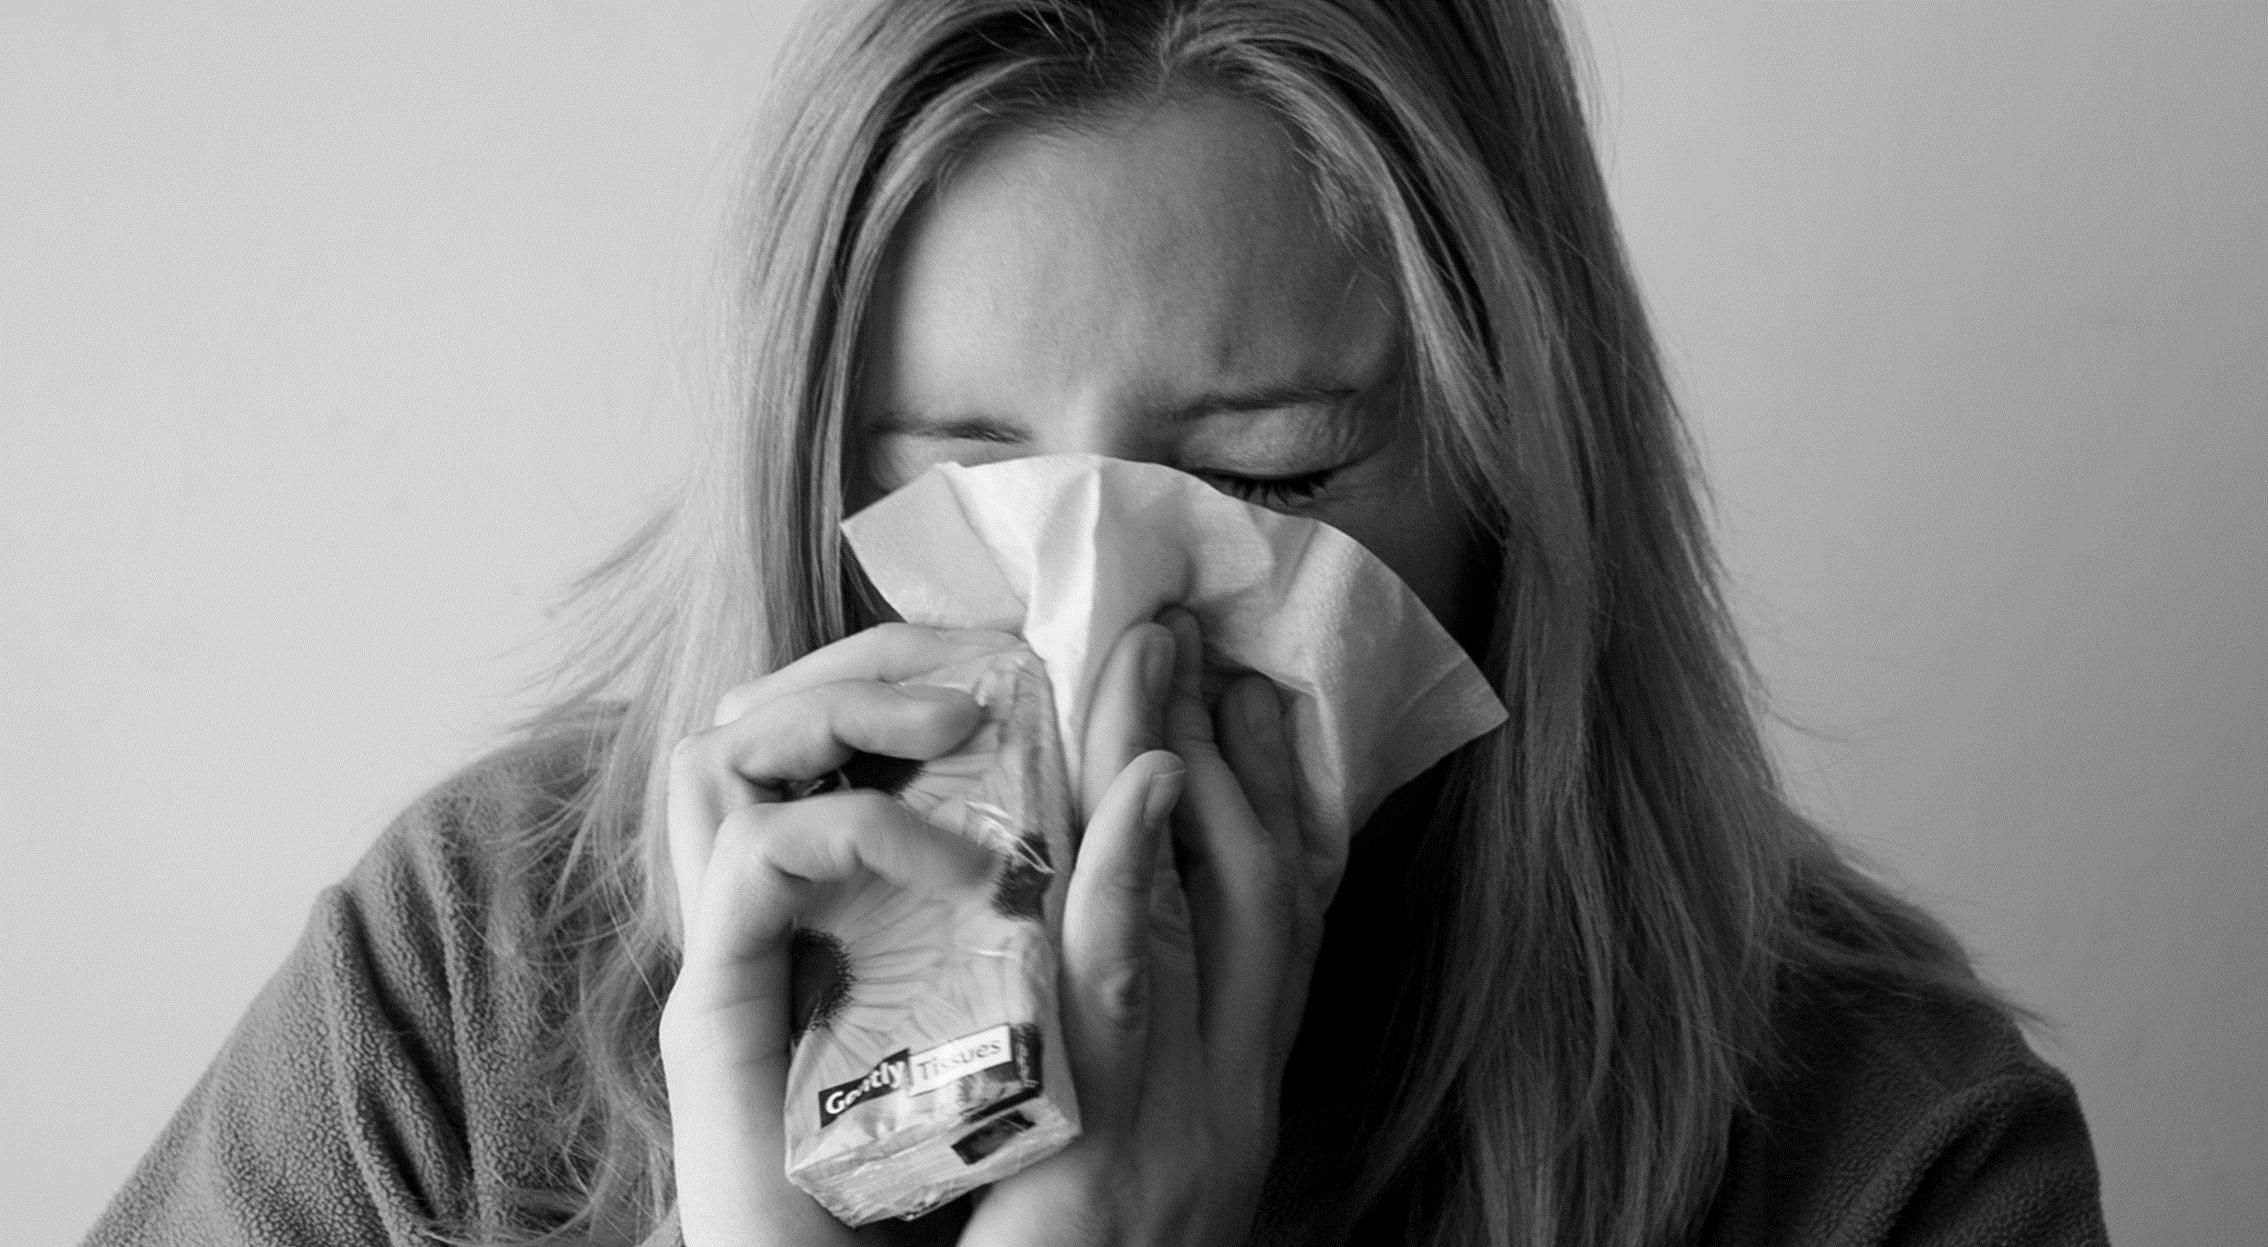 Griepepidemie (pixabay)